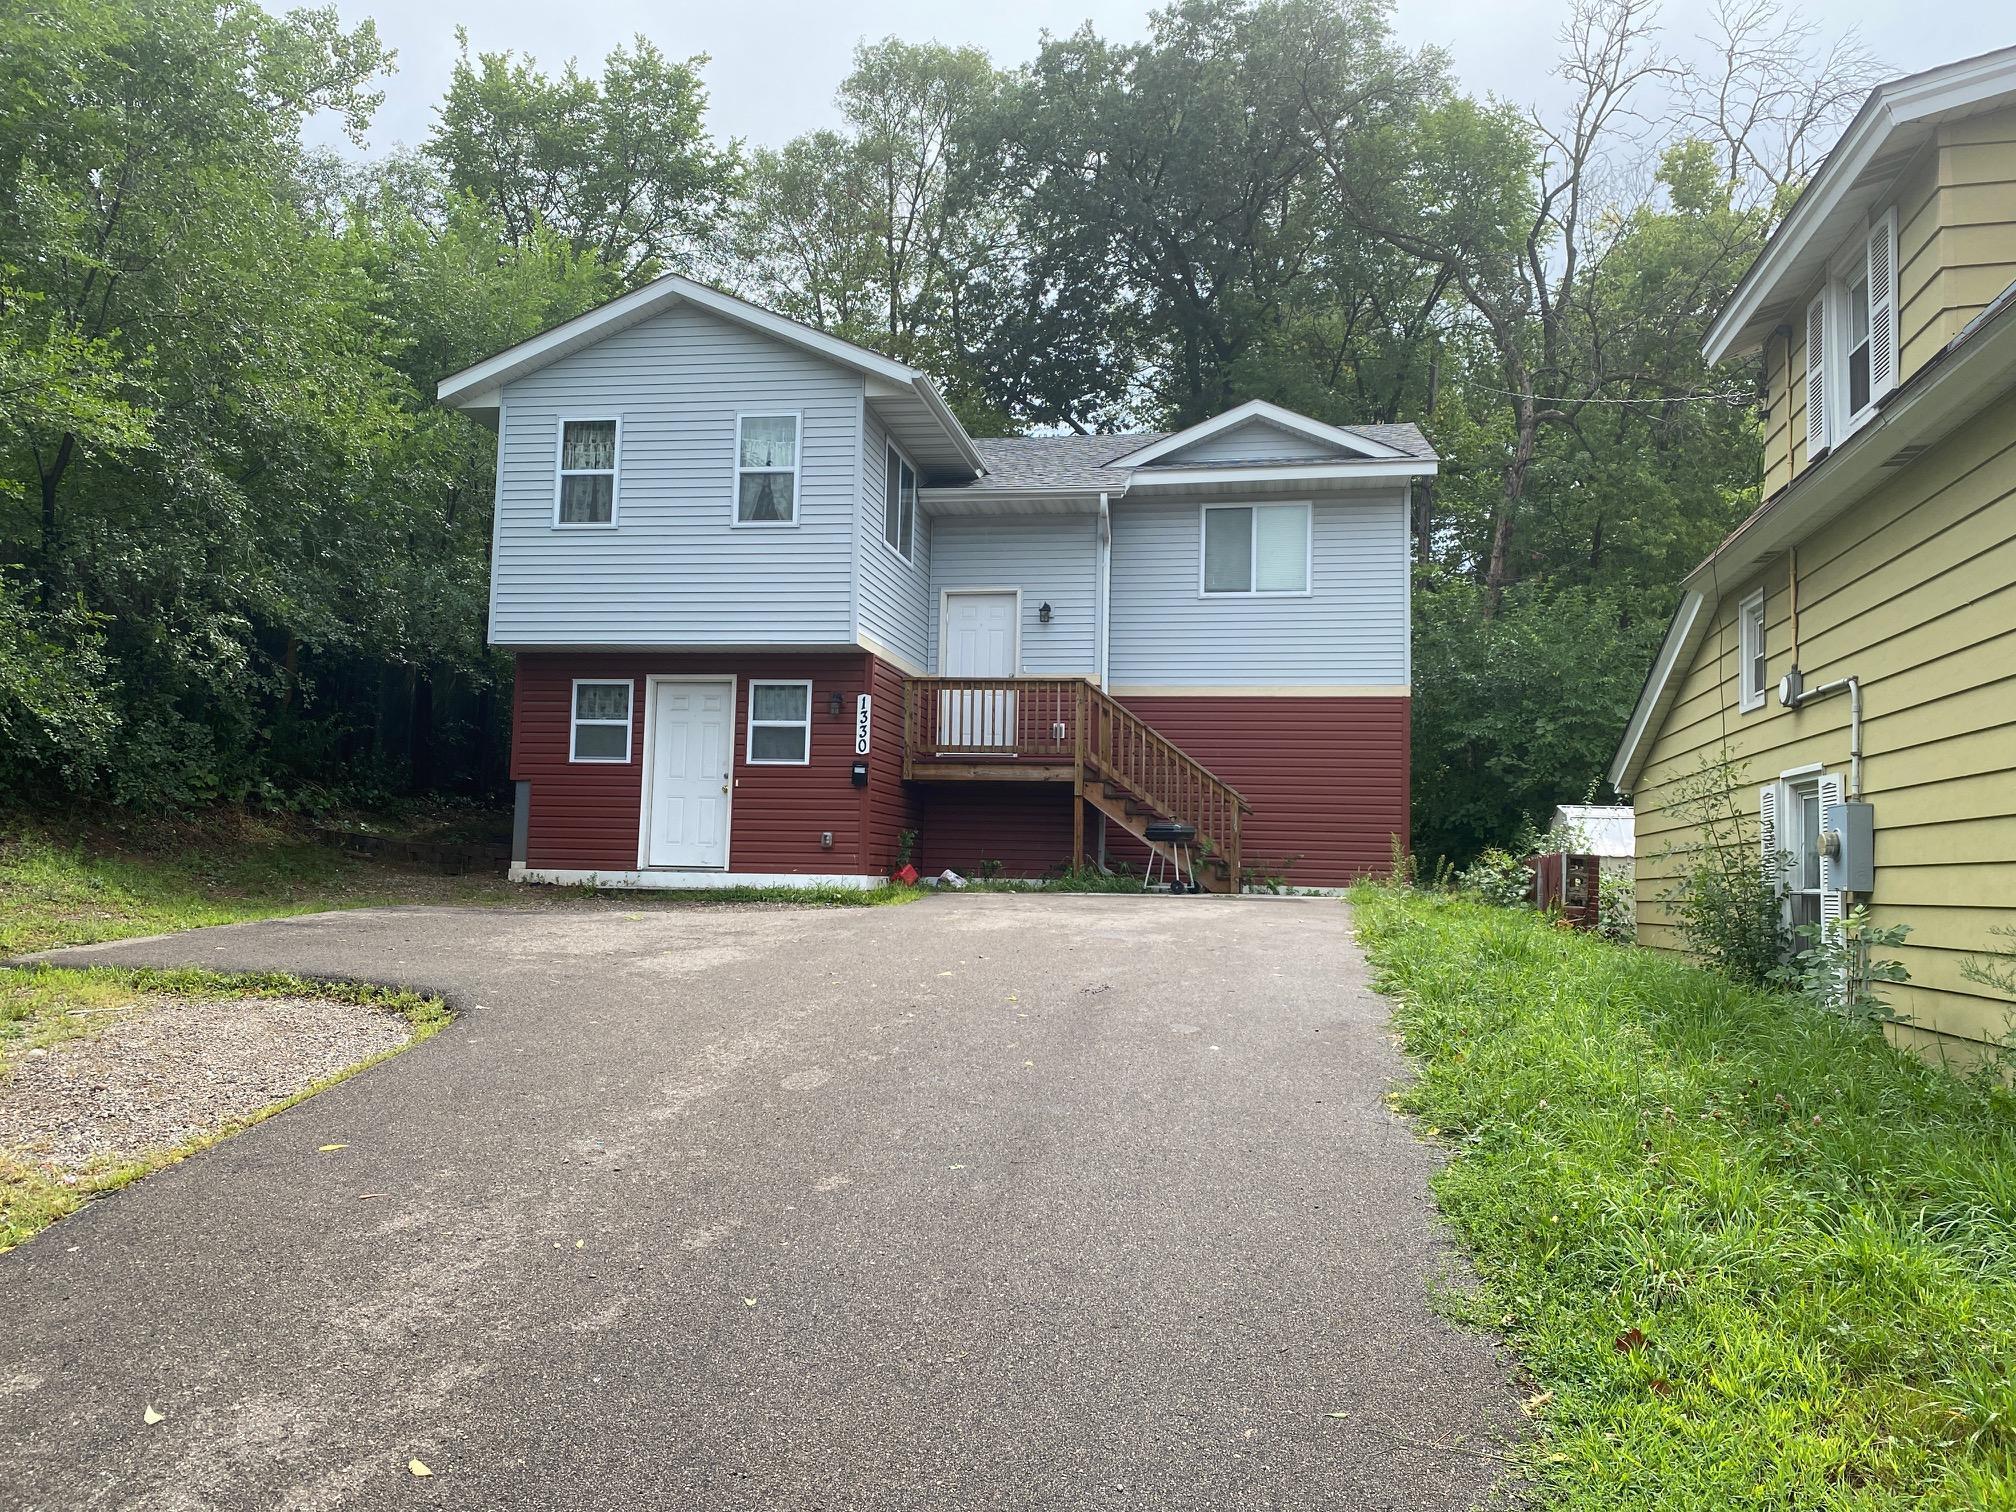 1330 7th Street, Saint Paul, Minnesota 55106, 4 Bedrooms Bedrooms, ,1 BathroomBathrooms,Residential,For Sale,7th,NST6091764